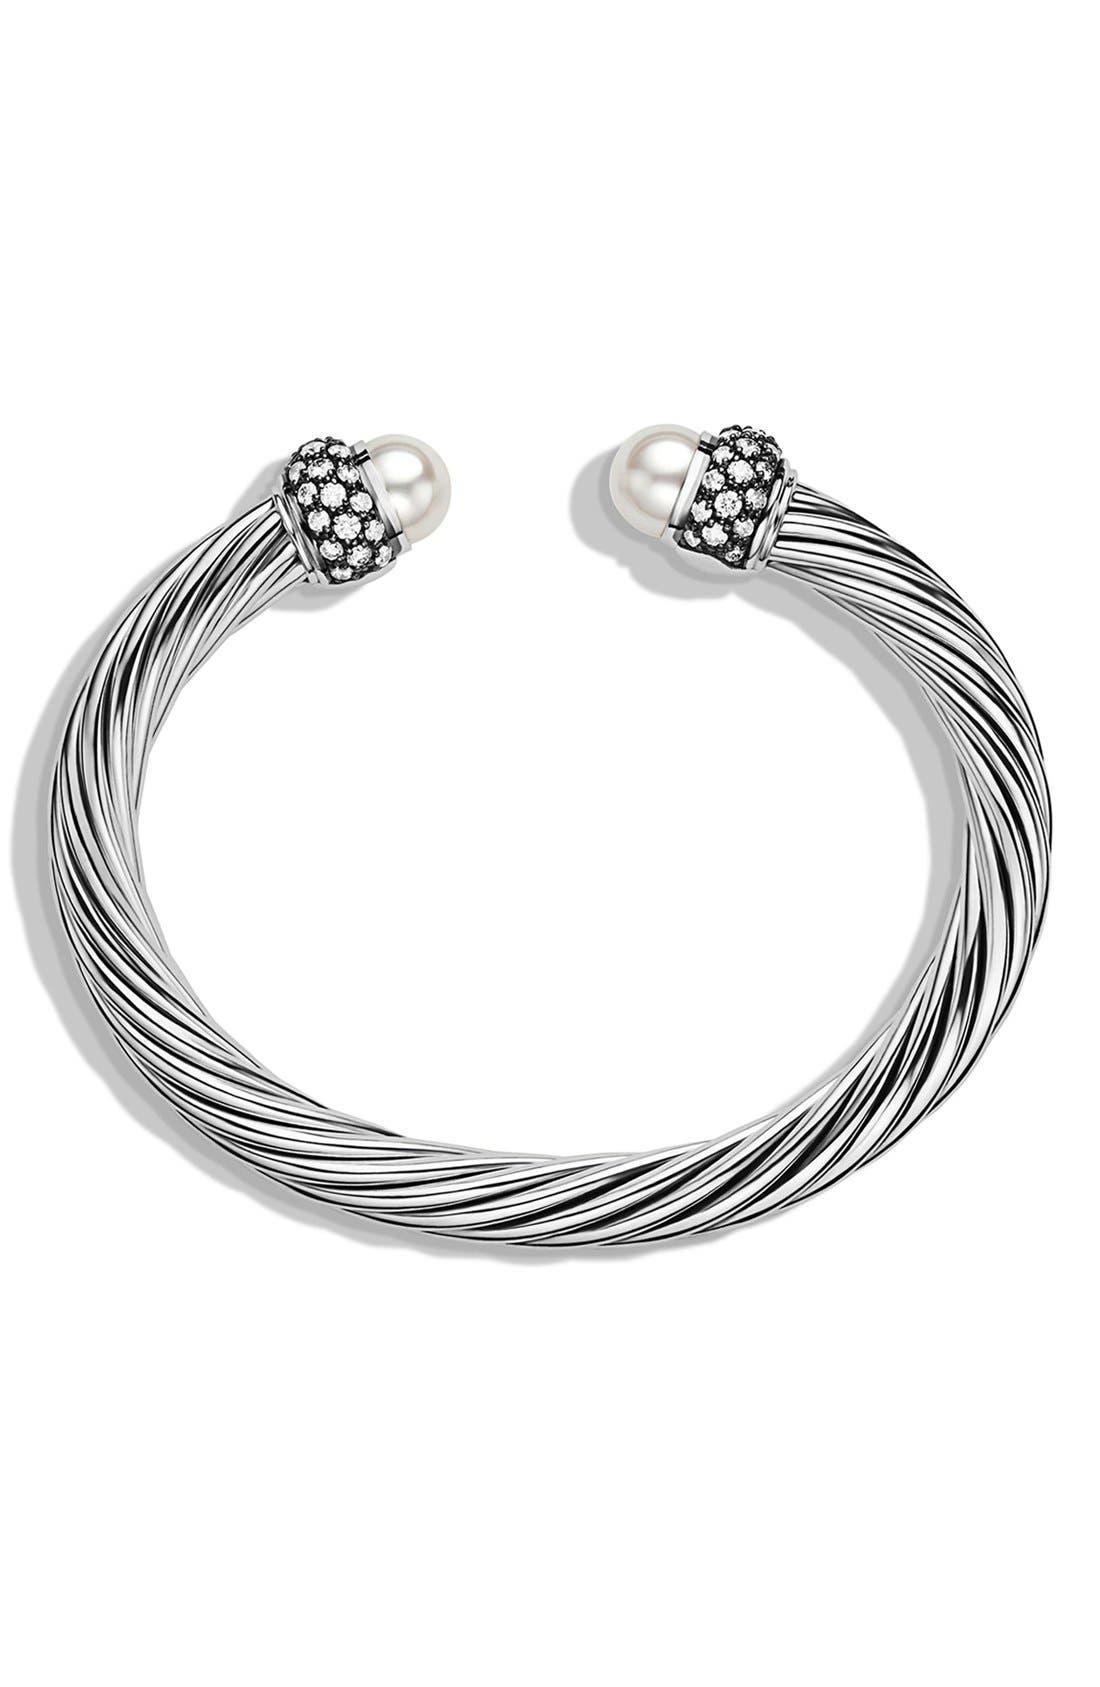 Alternate Image 2  - David Yurman 'Cable Classics' Bracelet with Pearls and Diamonds